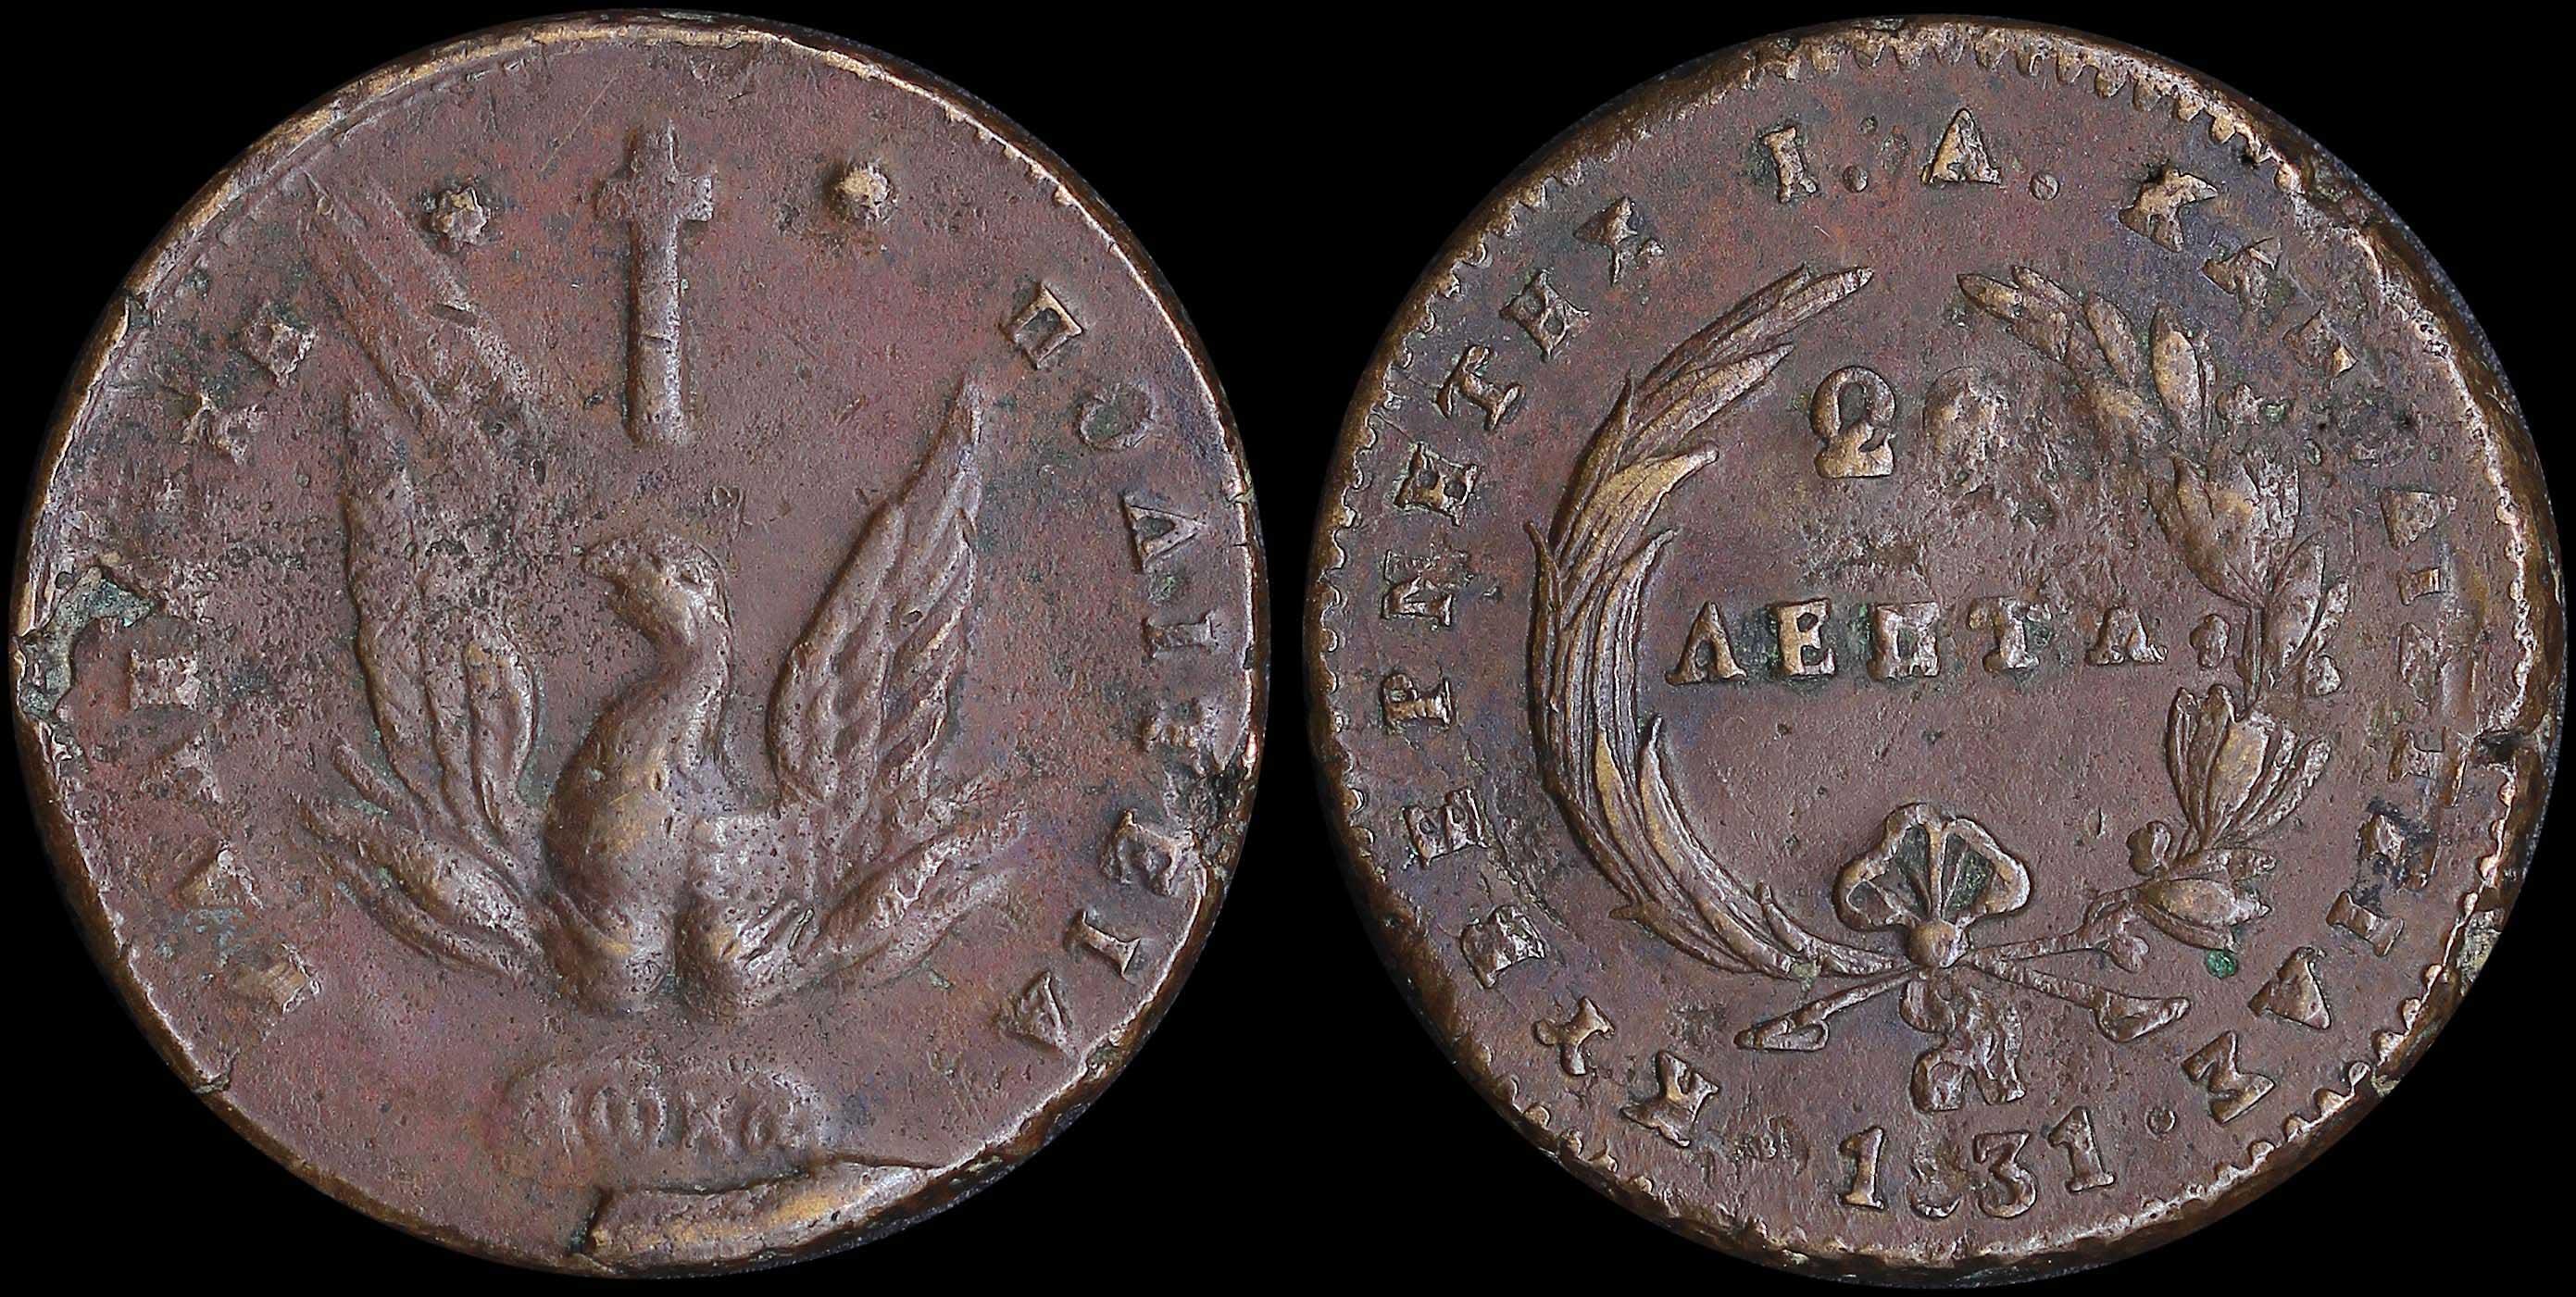 Lot 8047 - -  COINS & TOKENS governor capodistrias -  A. Karamitsos Public & Live Bid Auction 649 Coins, Medals & Banknotes